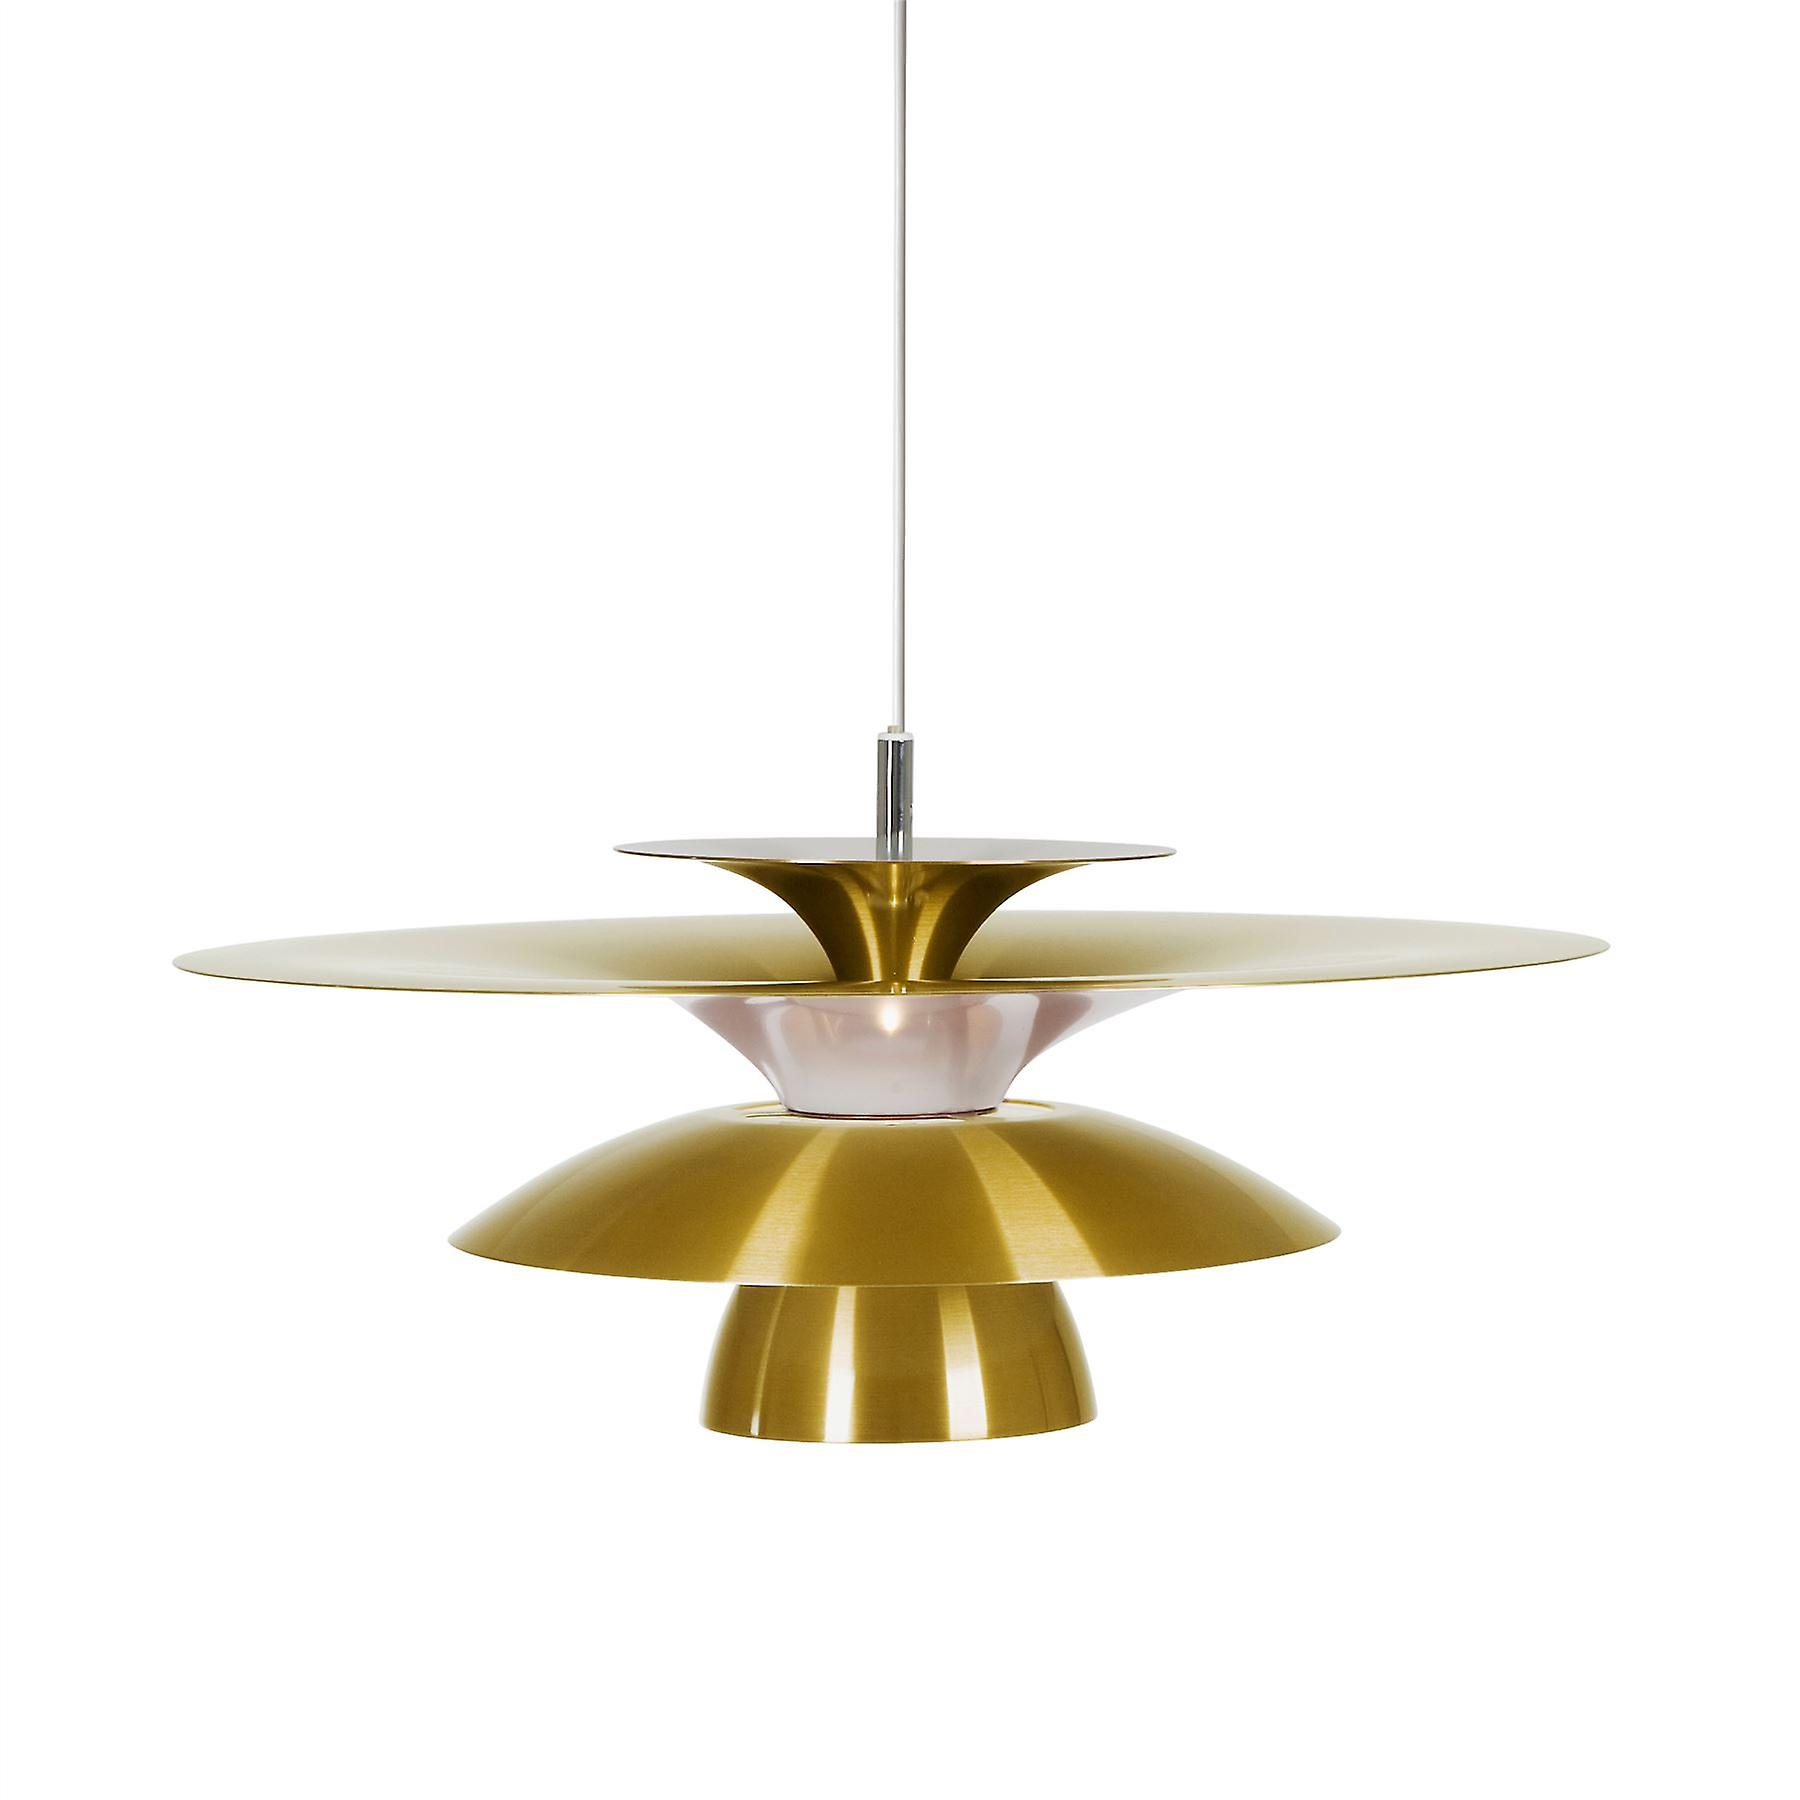 Belid - Picasso LED Pendant Light Brass Finish 141710